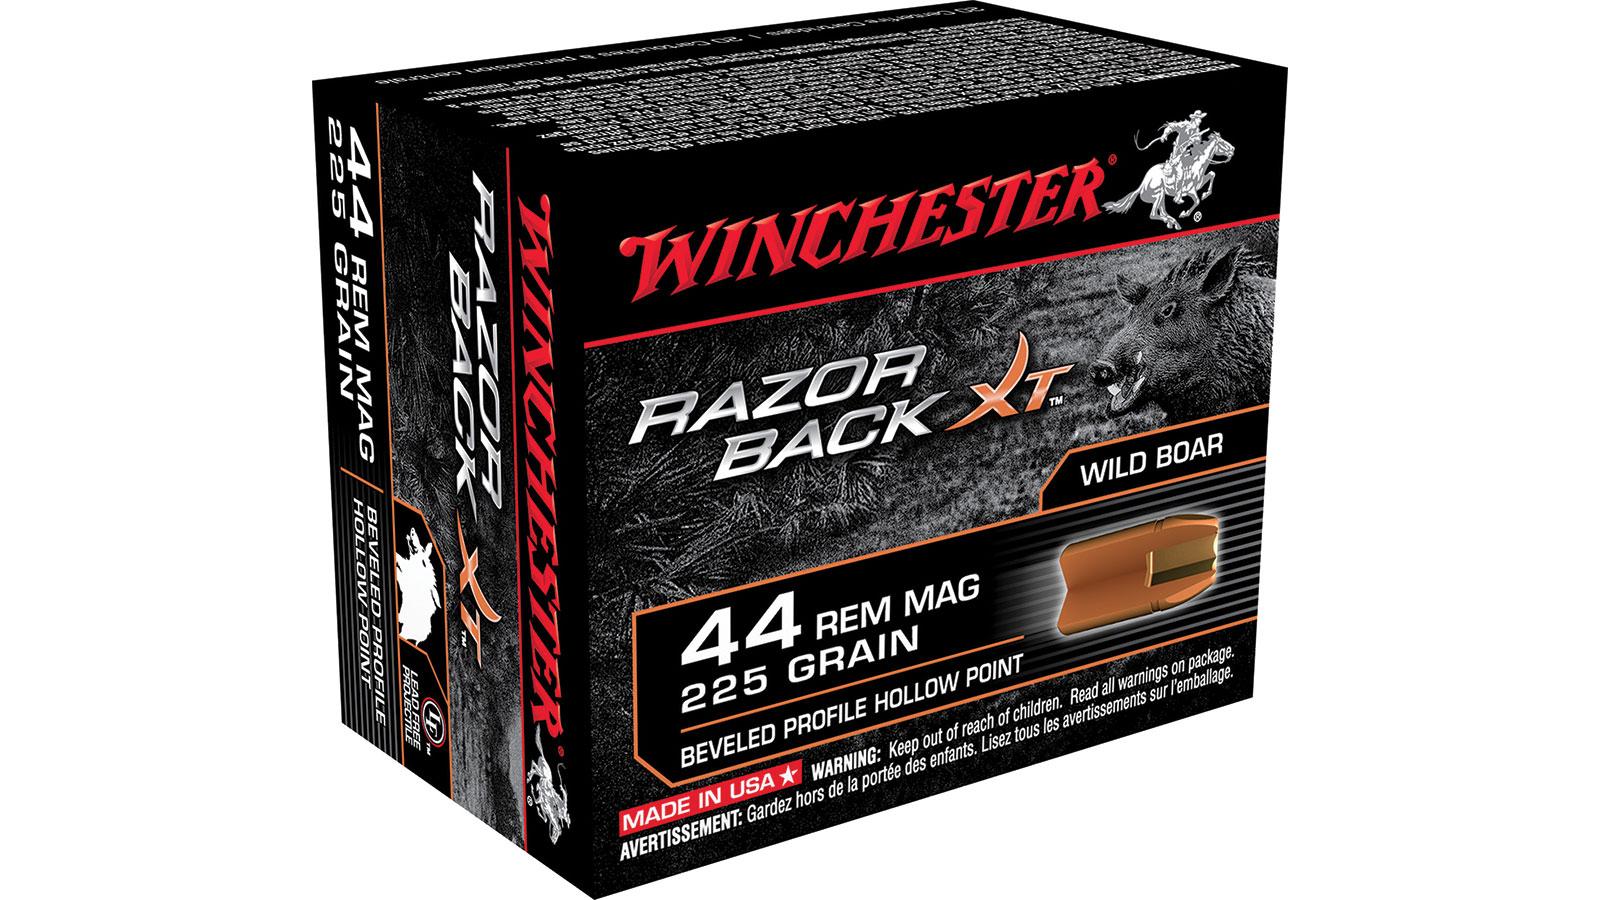 44 Mag - 225 Grain BPHP - Winchester Razorback - 20 Rounds